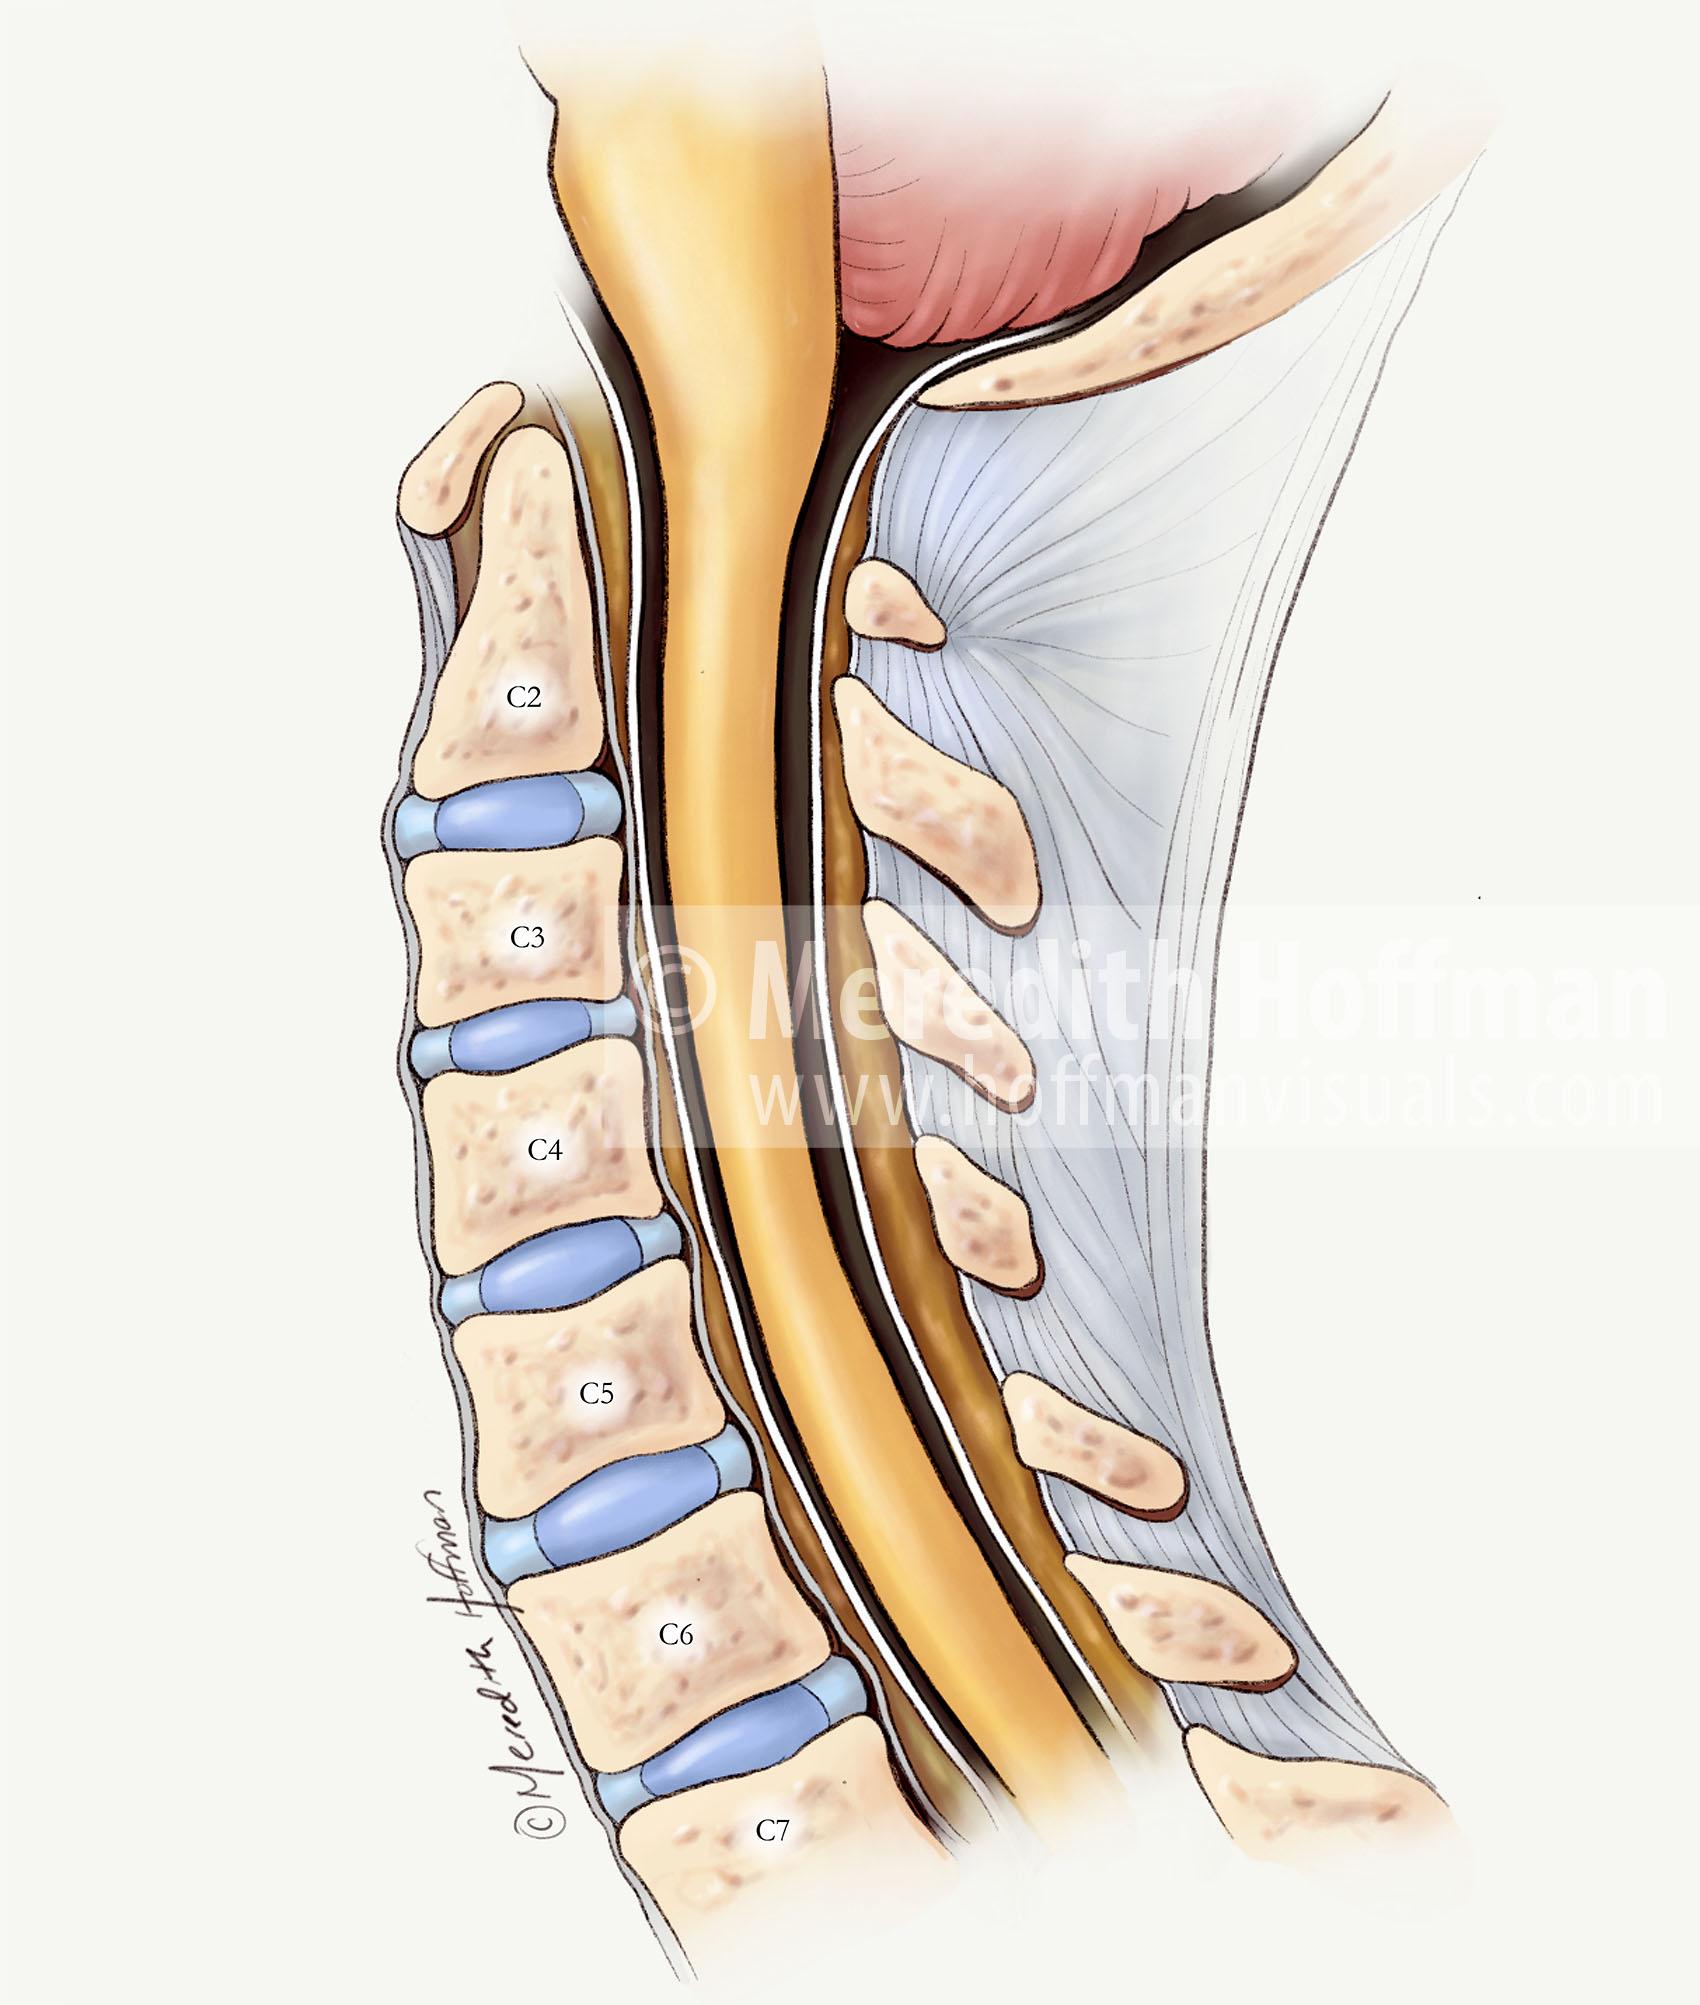 Sagittal view of the cervical spine